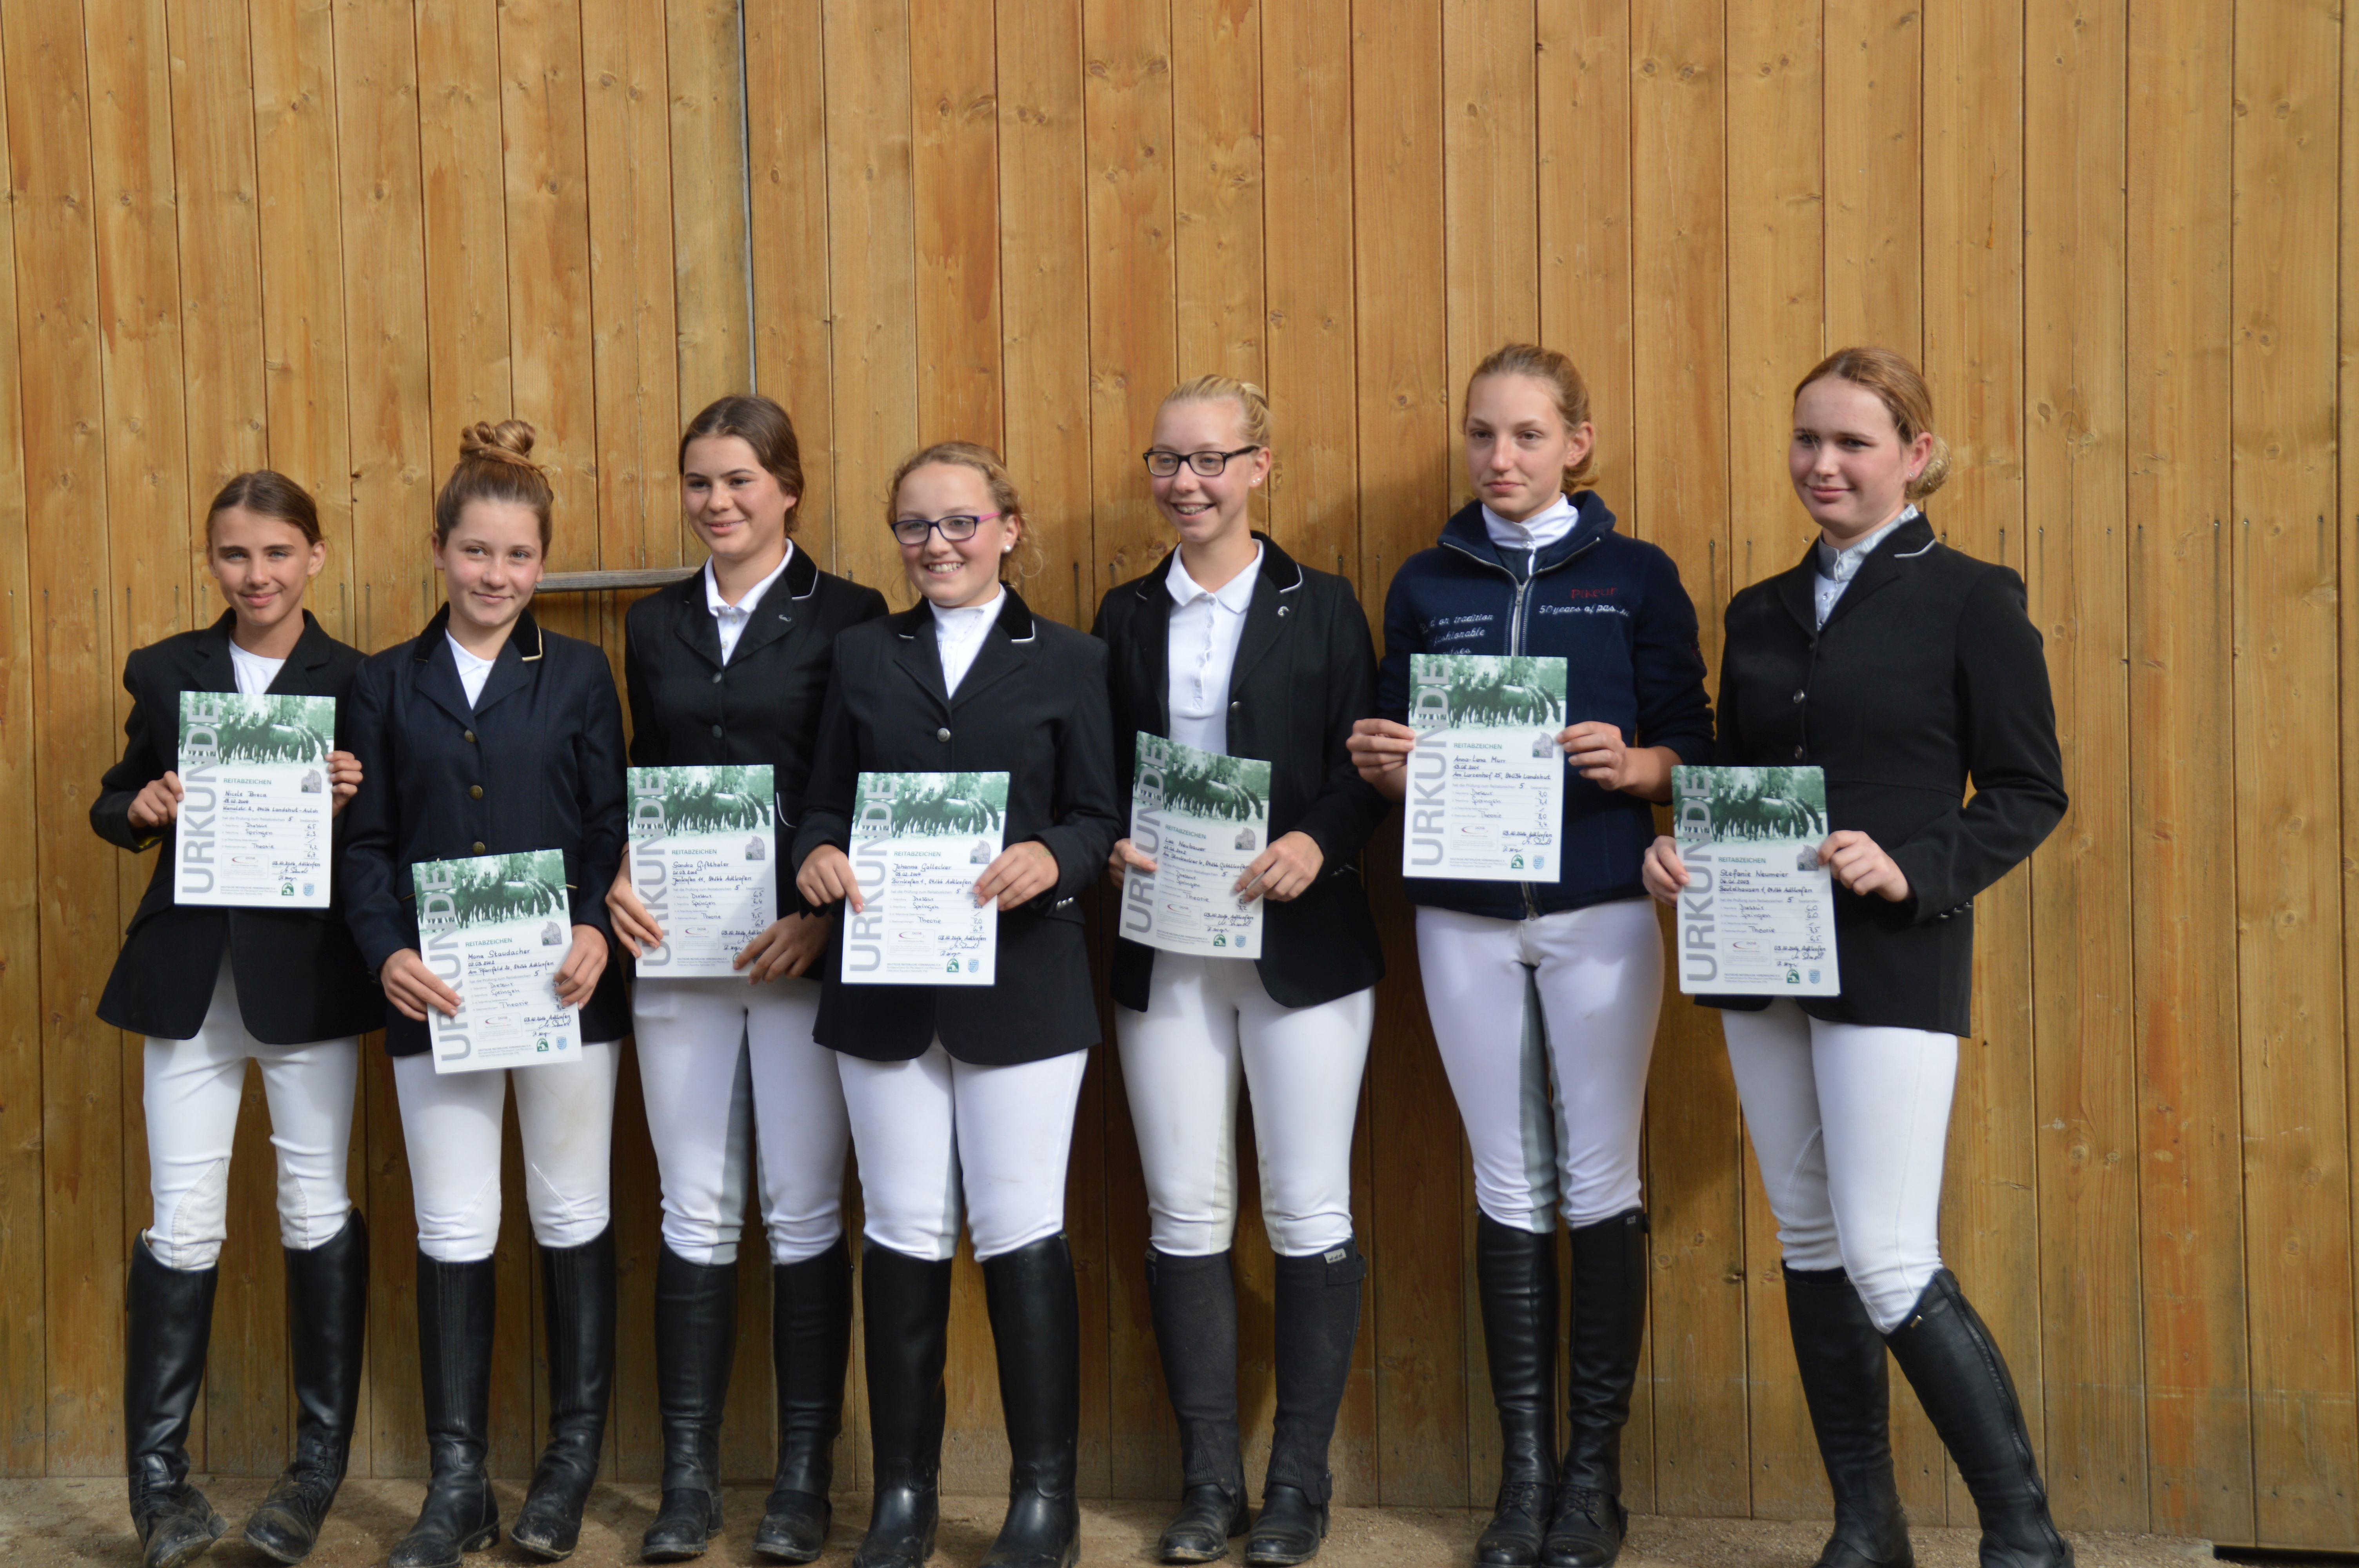 von links: Breca Nicole, Staudacher Mona, Giftthaler Sandra, Gallecker Johanna, Neubauer Lea, Murr Anna-Lena, Neumeier Stefanie